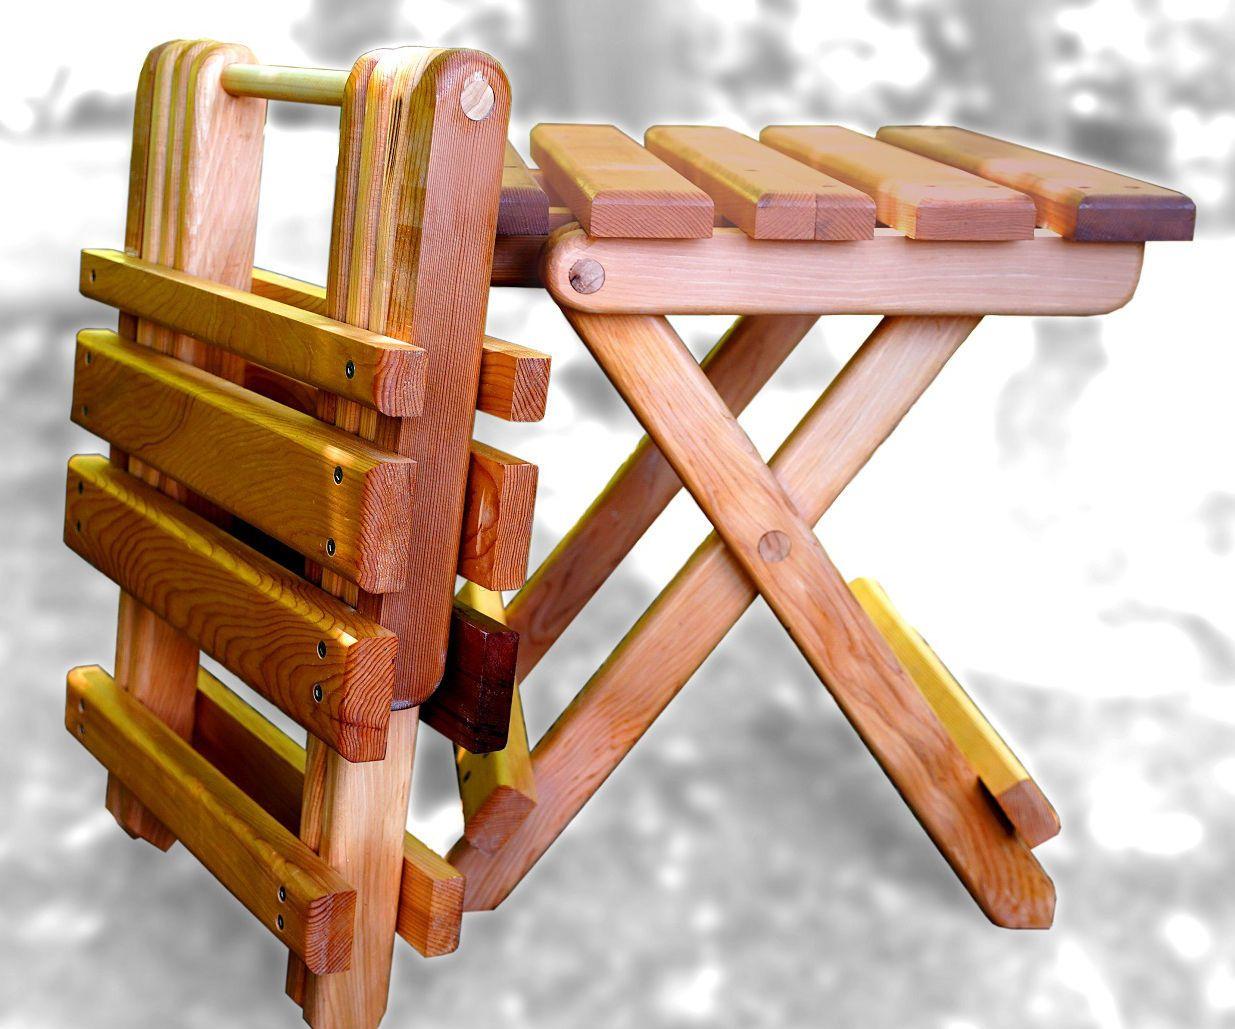 Collapsible Folding Adirondack Table Wood folding table